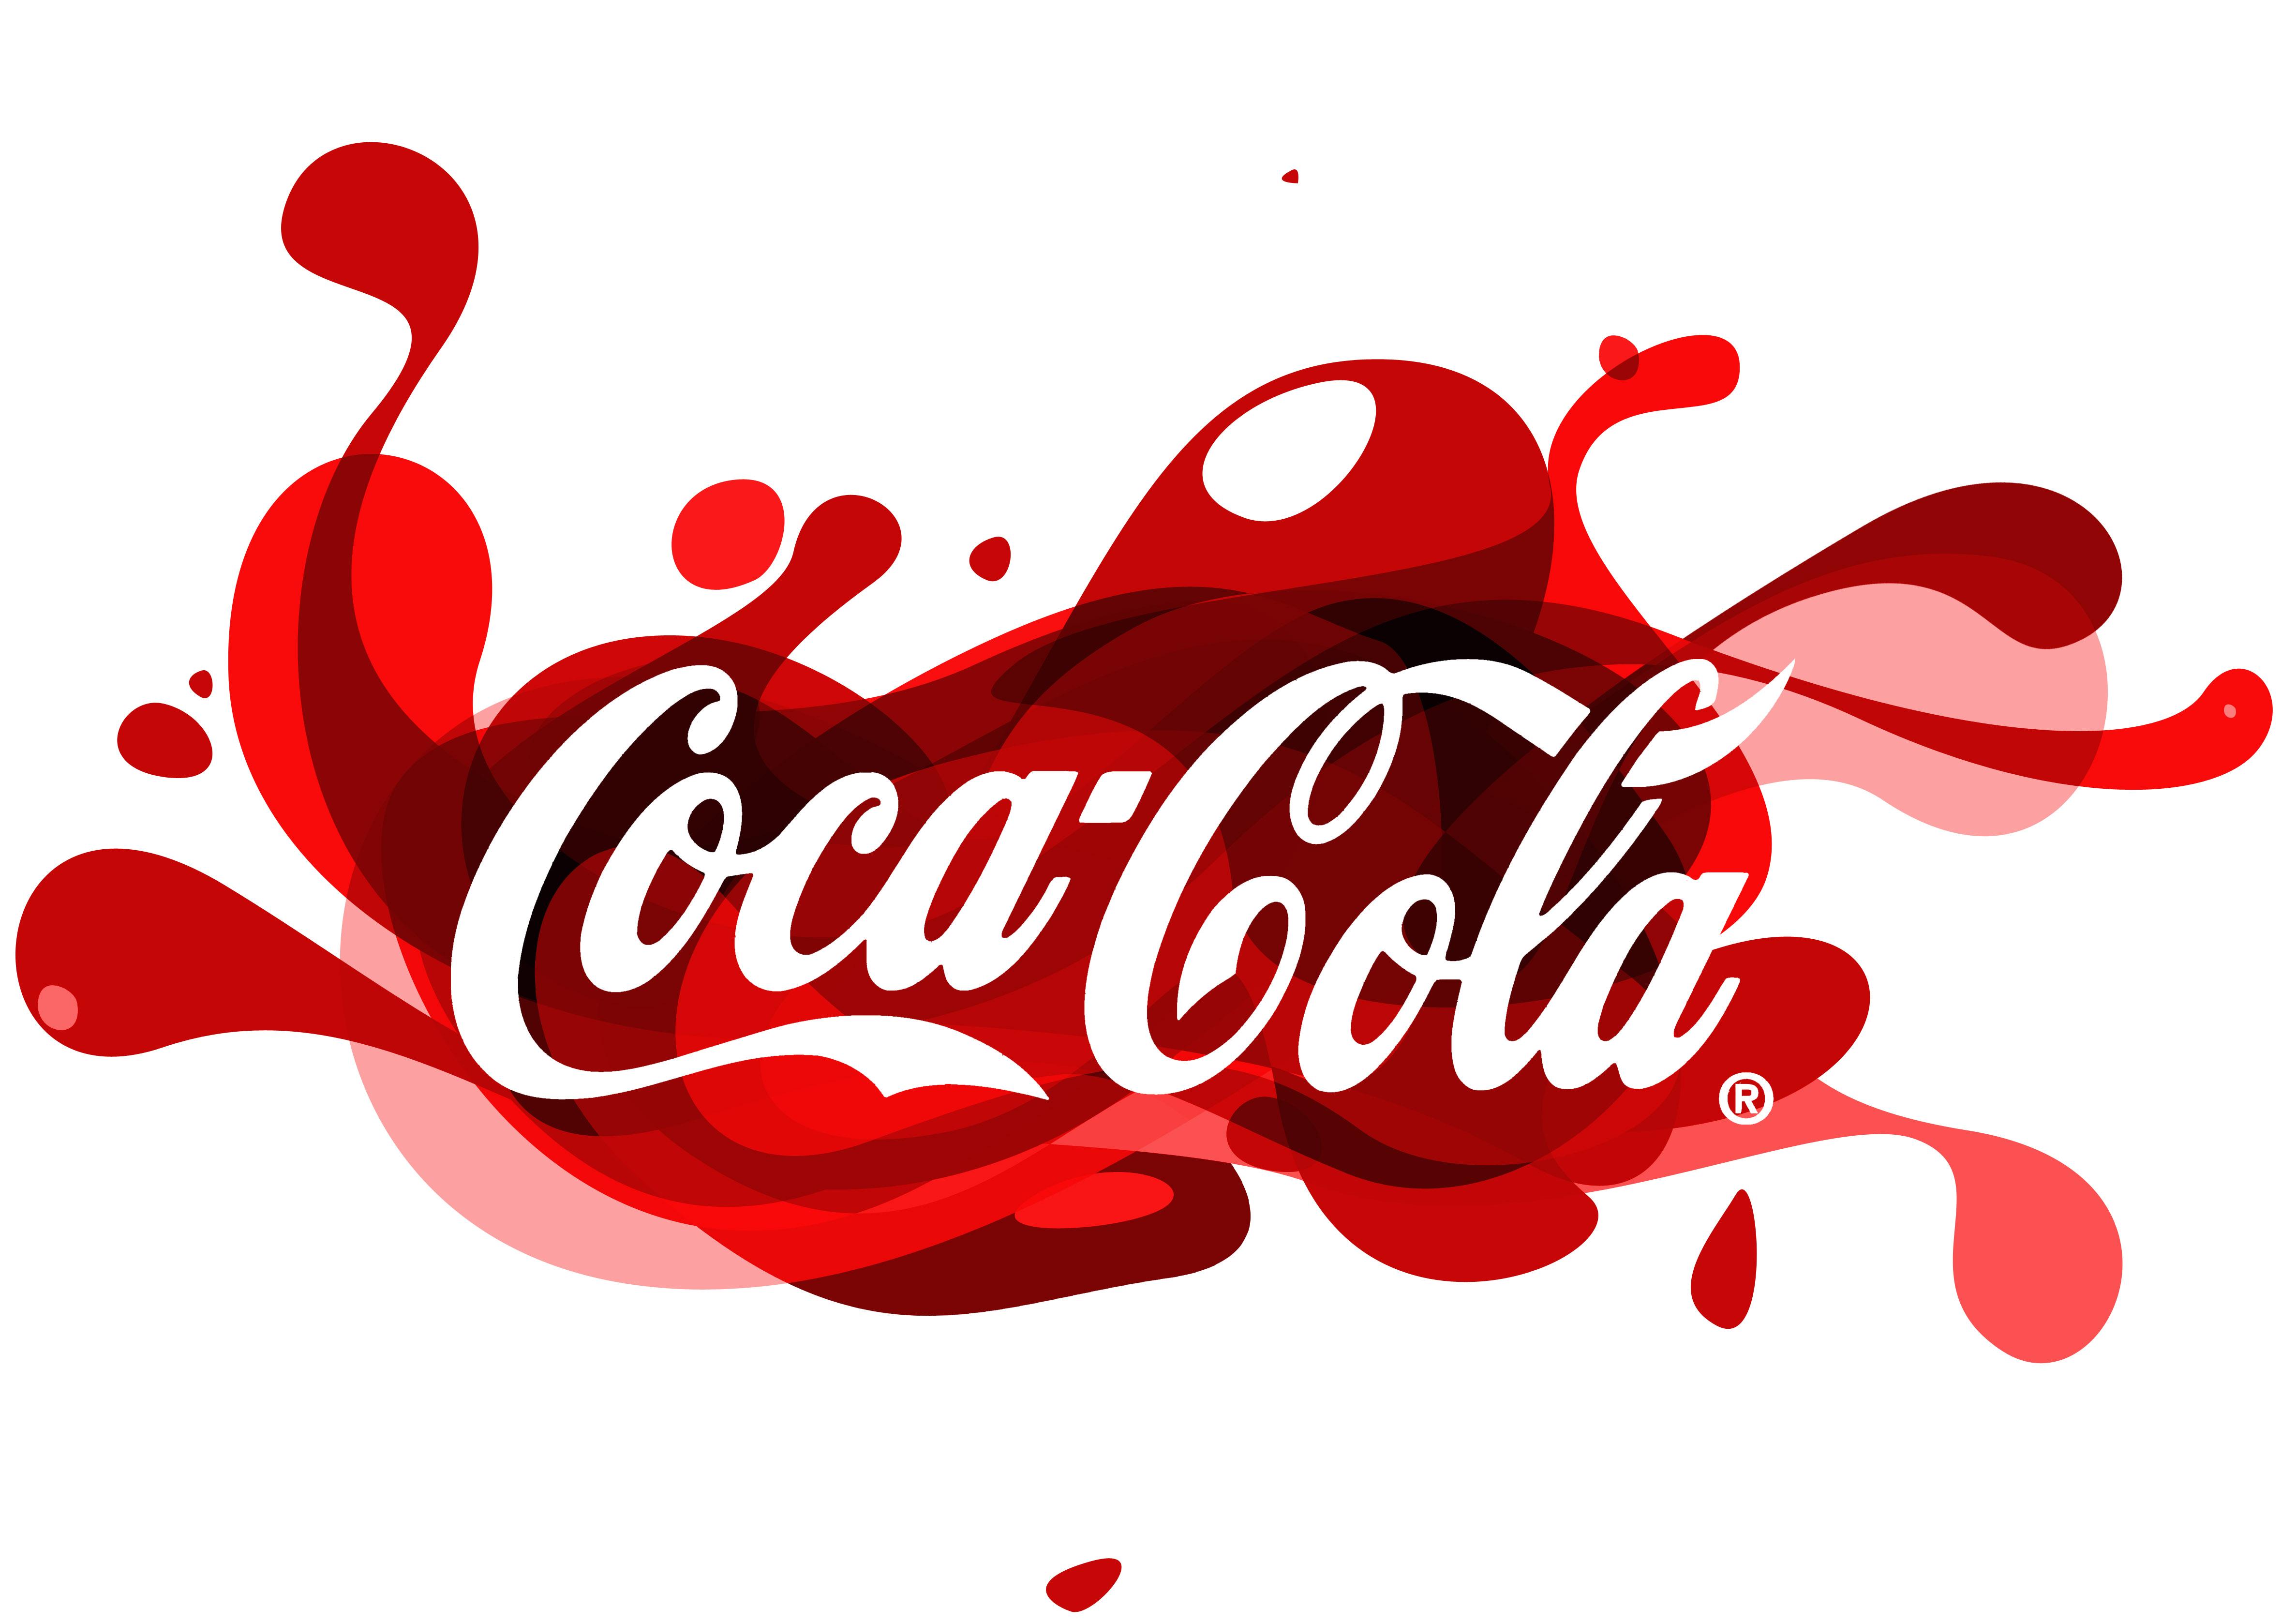 Pepsi Vs Coca Cola Halloween Ad.Why Do Coca Cola Advertise The Marketing Agenda